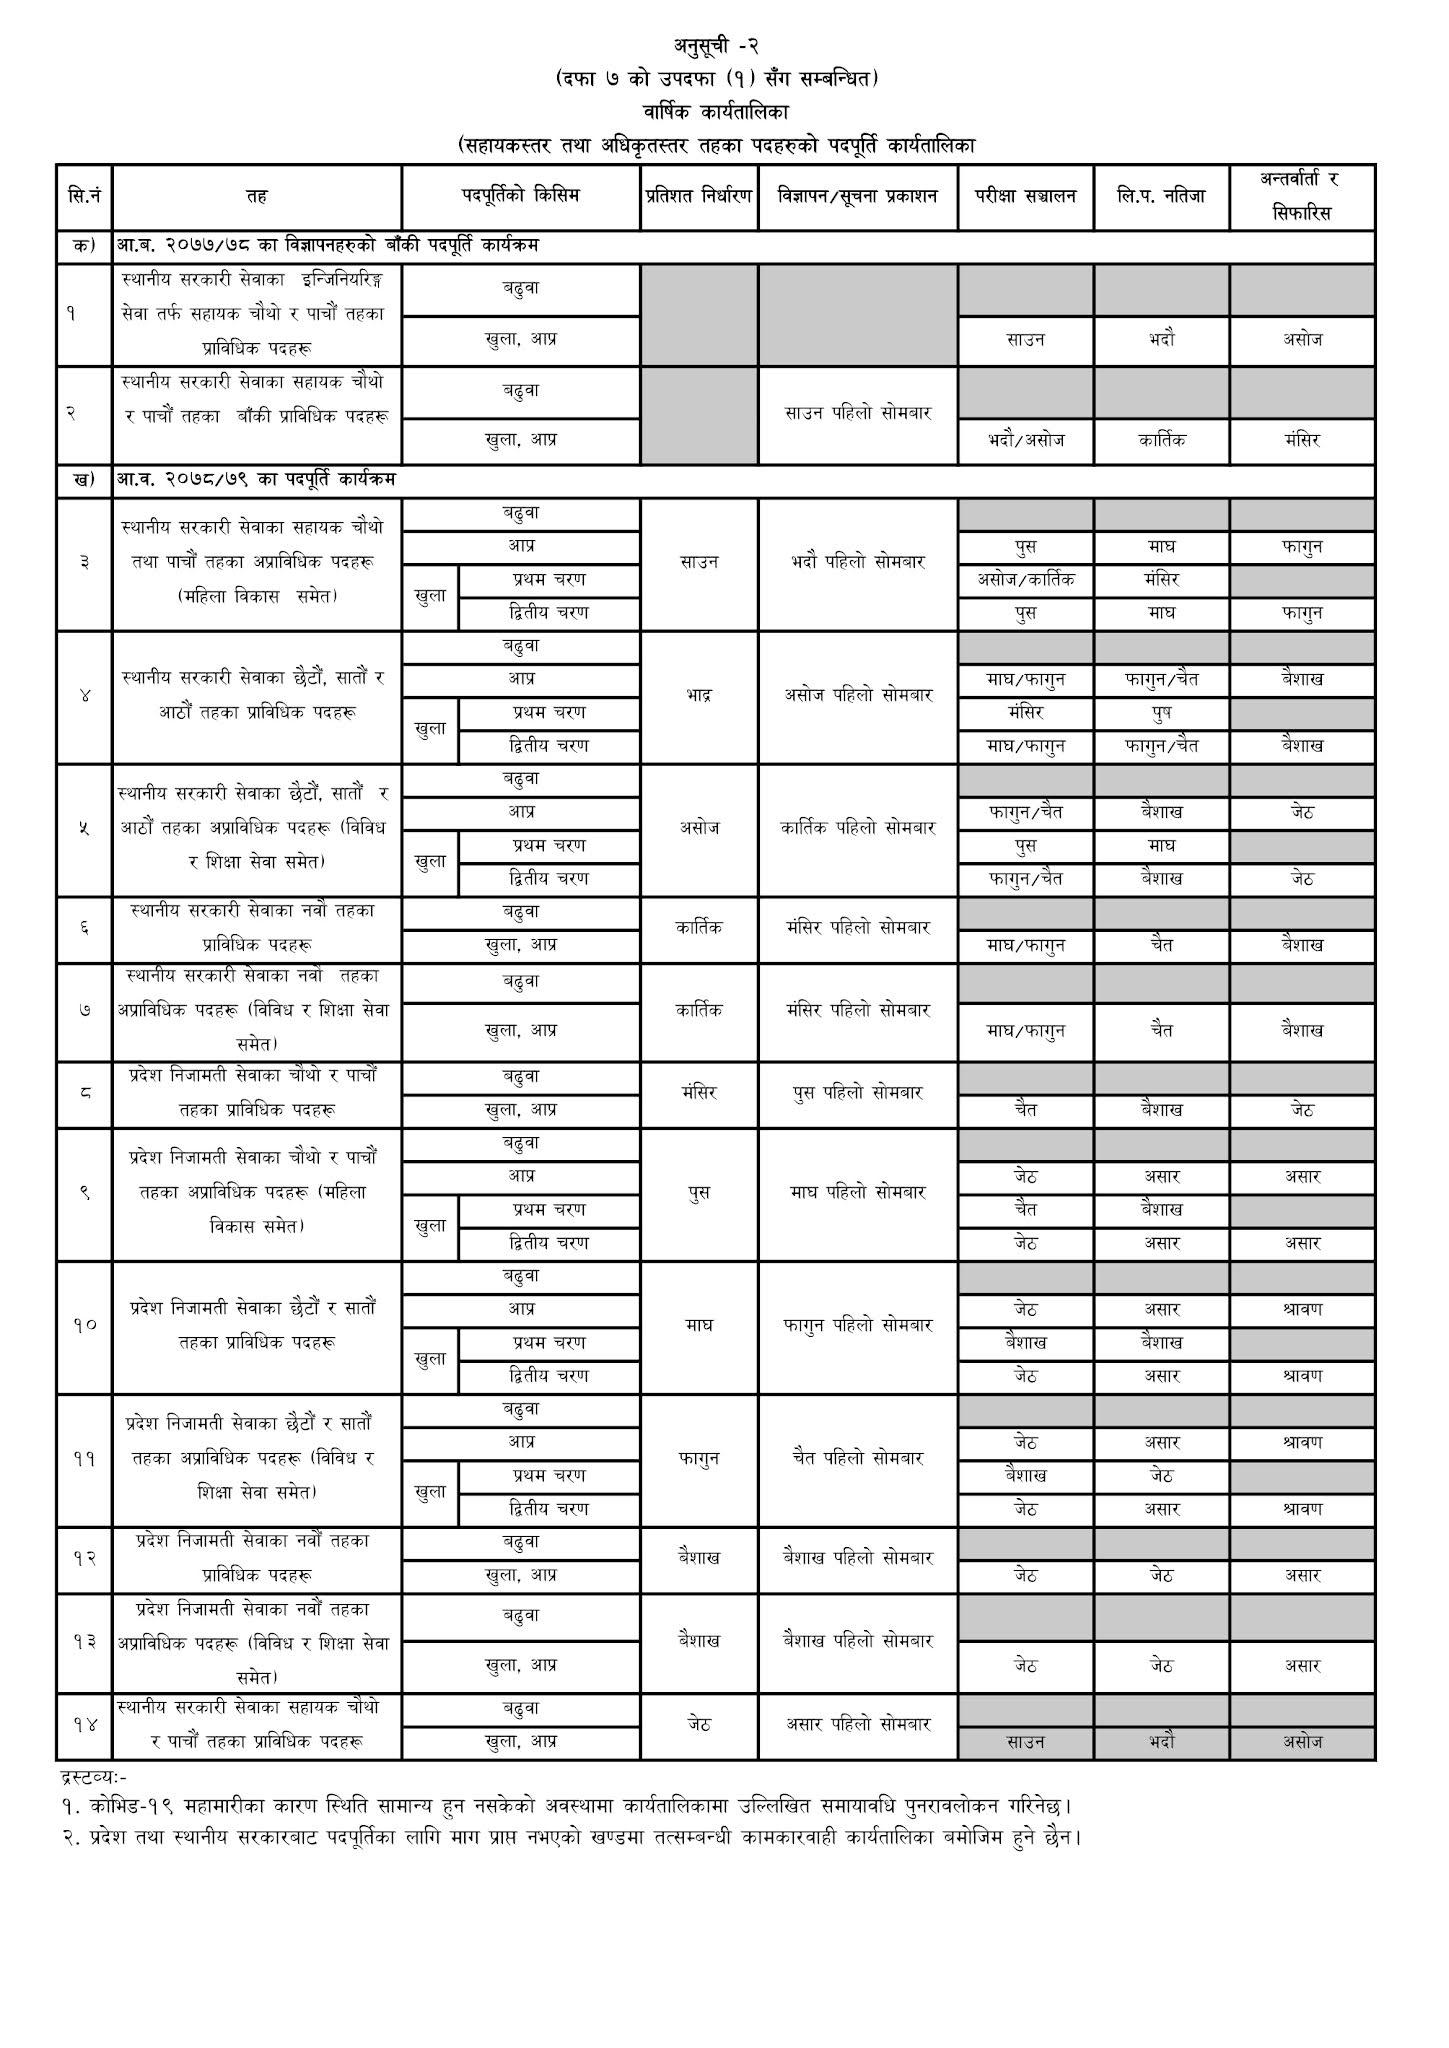 Pradesh 1 Lok Sewa Aayog Vacancy Yearly Calendar 2078 / 2079